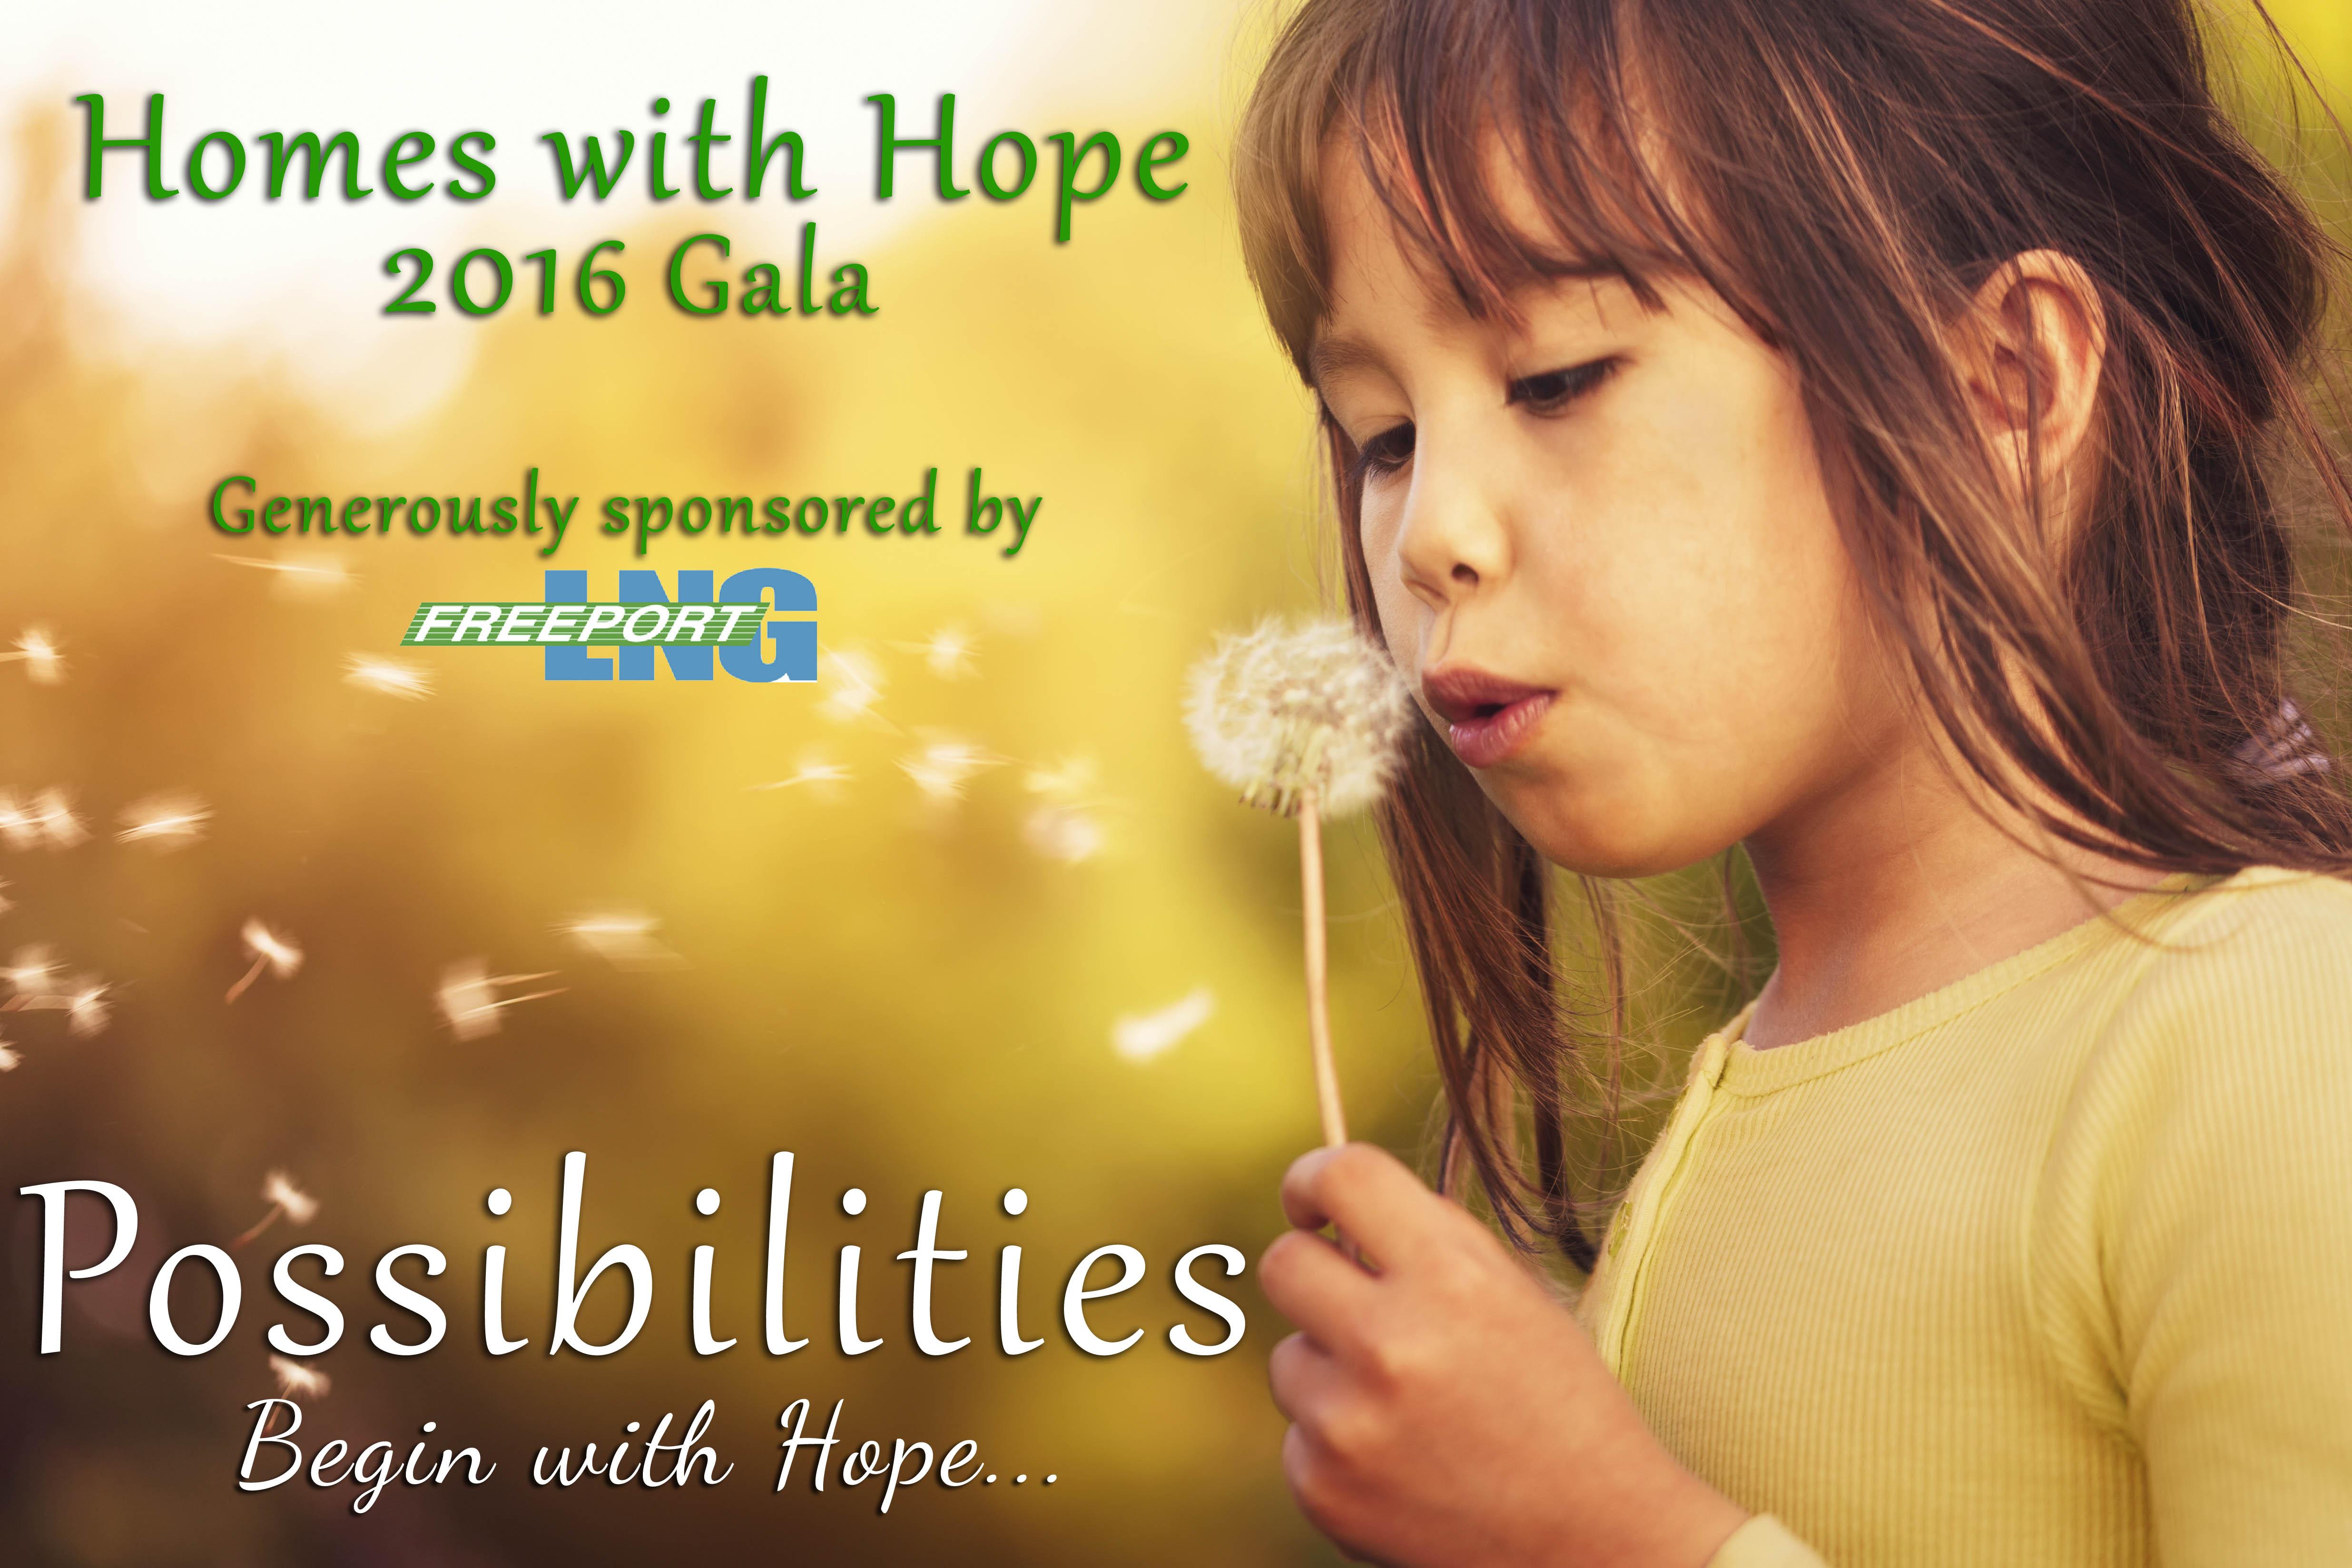 2016 Gala - Freeport Sponsor